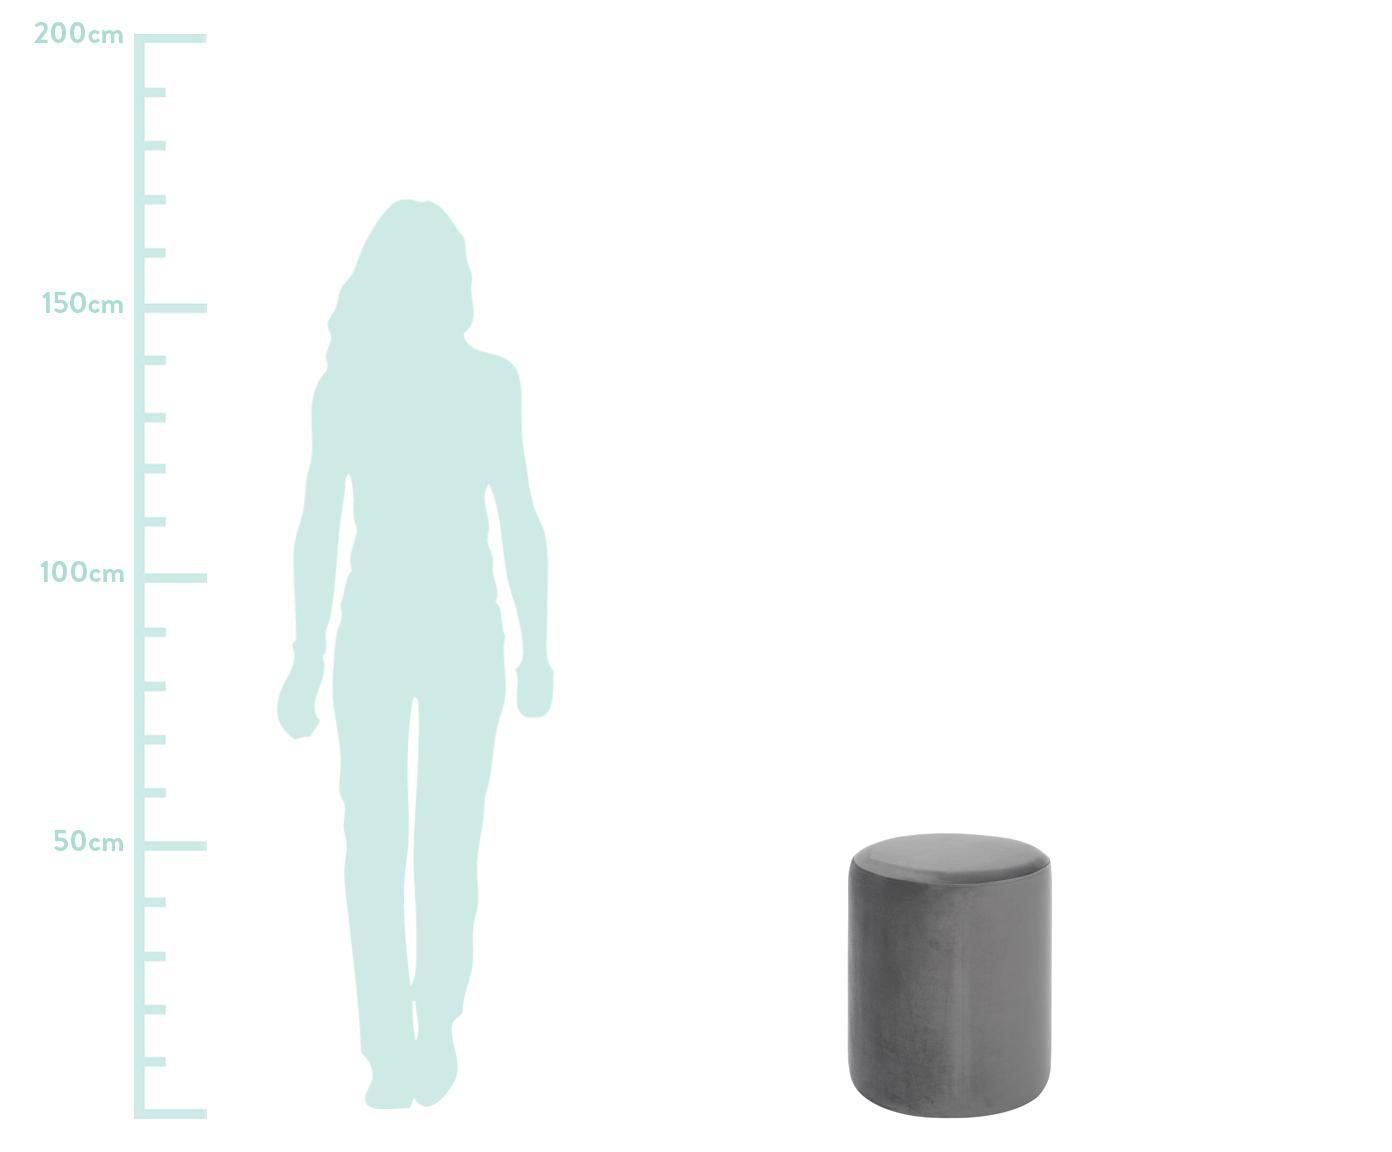 Samt-Hocker Daisy, Bezug: Samt (Polyester) Der hoch, Rahmen: Sperrholz, Samt Grau, Ø 38 x H 45 cm